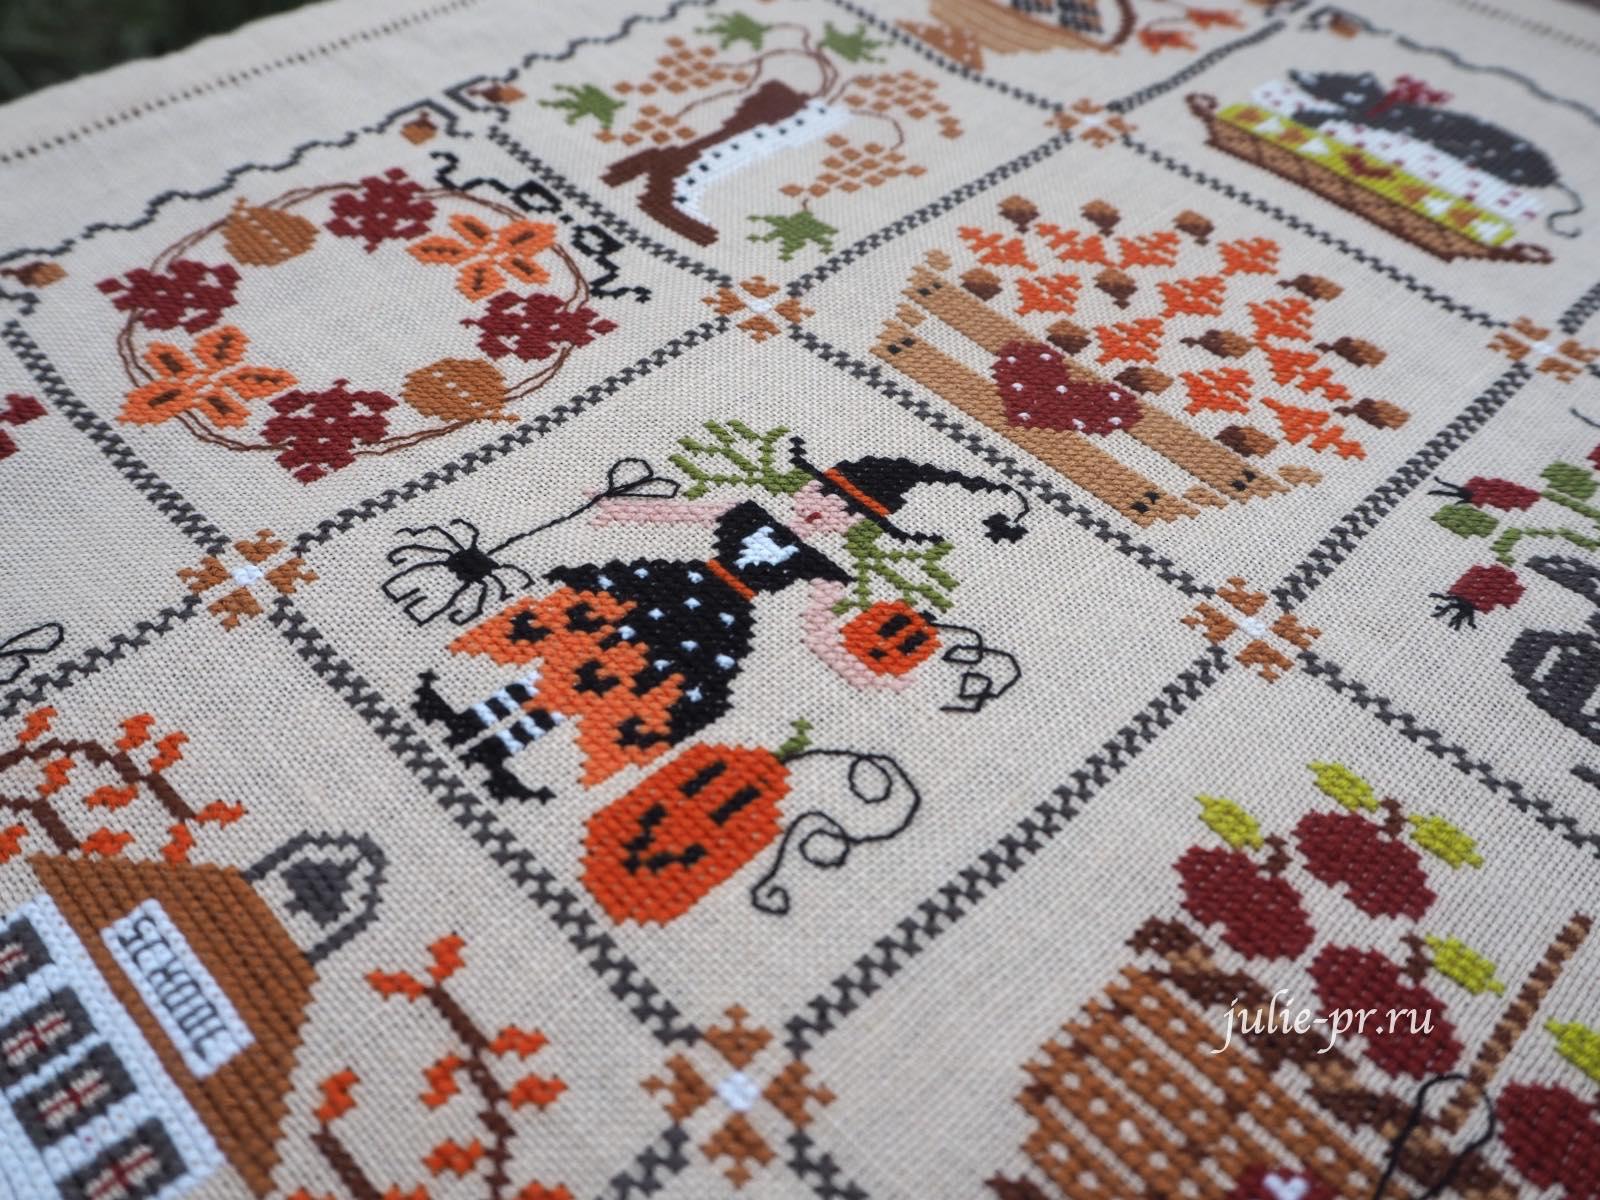 вышивка крестом, Cuore e batticuore - Shabby Autumn Calendar, осенний шебби календарь